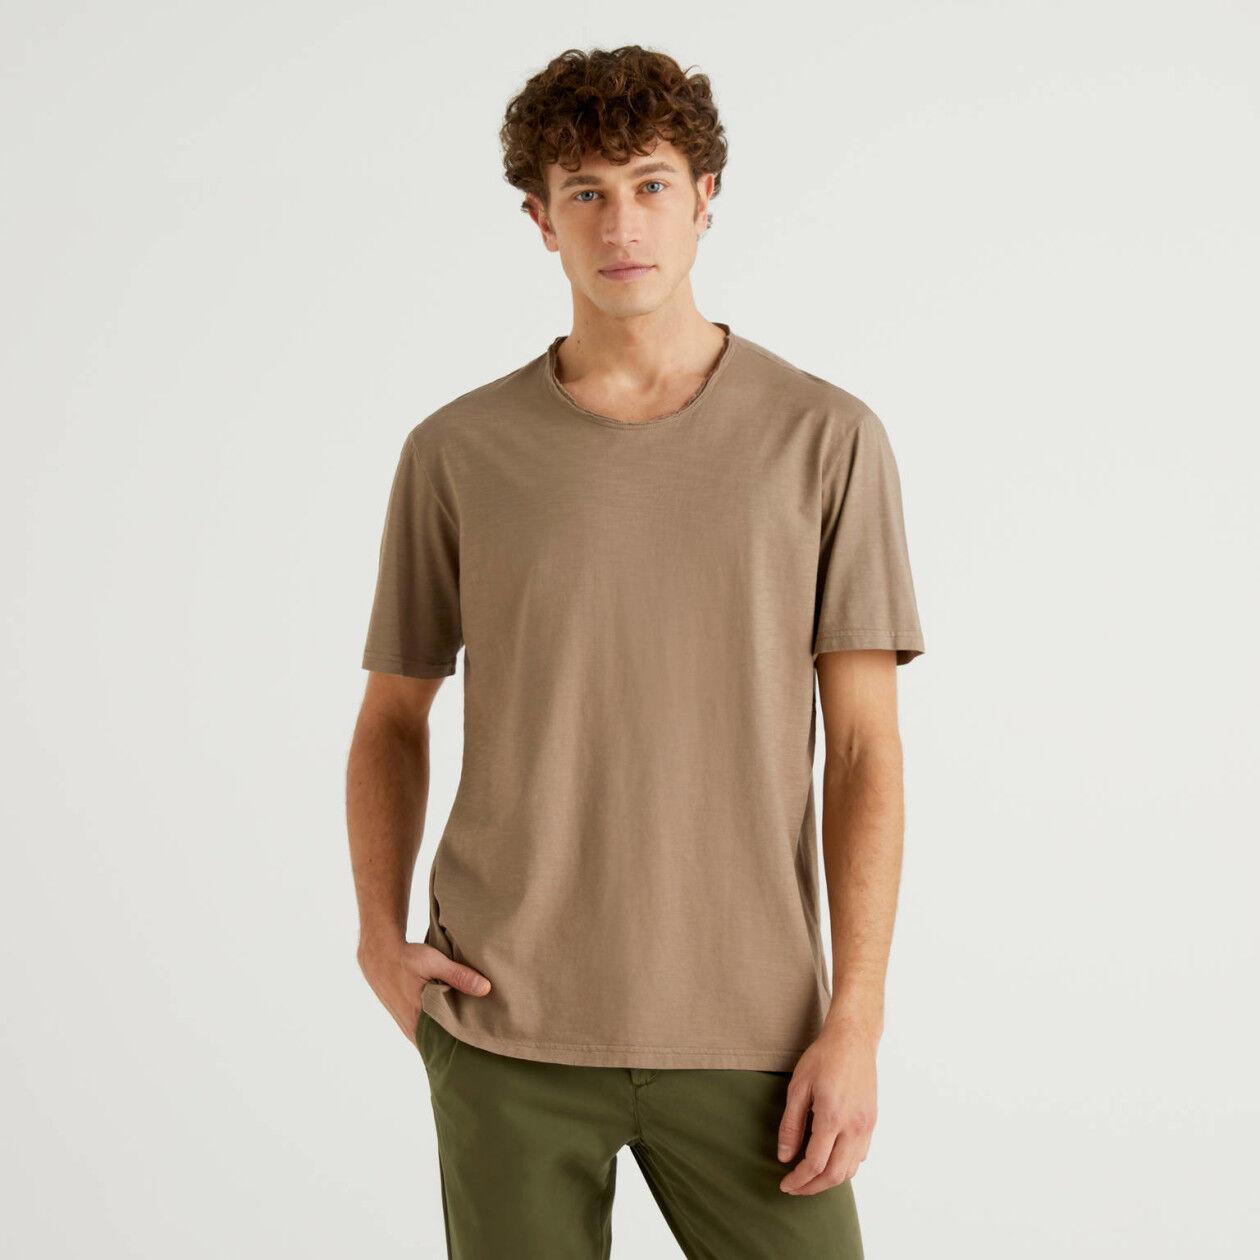 T-shirt dove grey από αγνό βαμβακερό